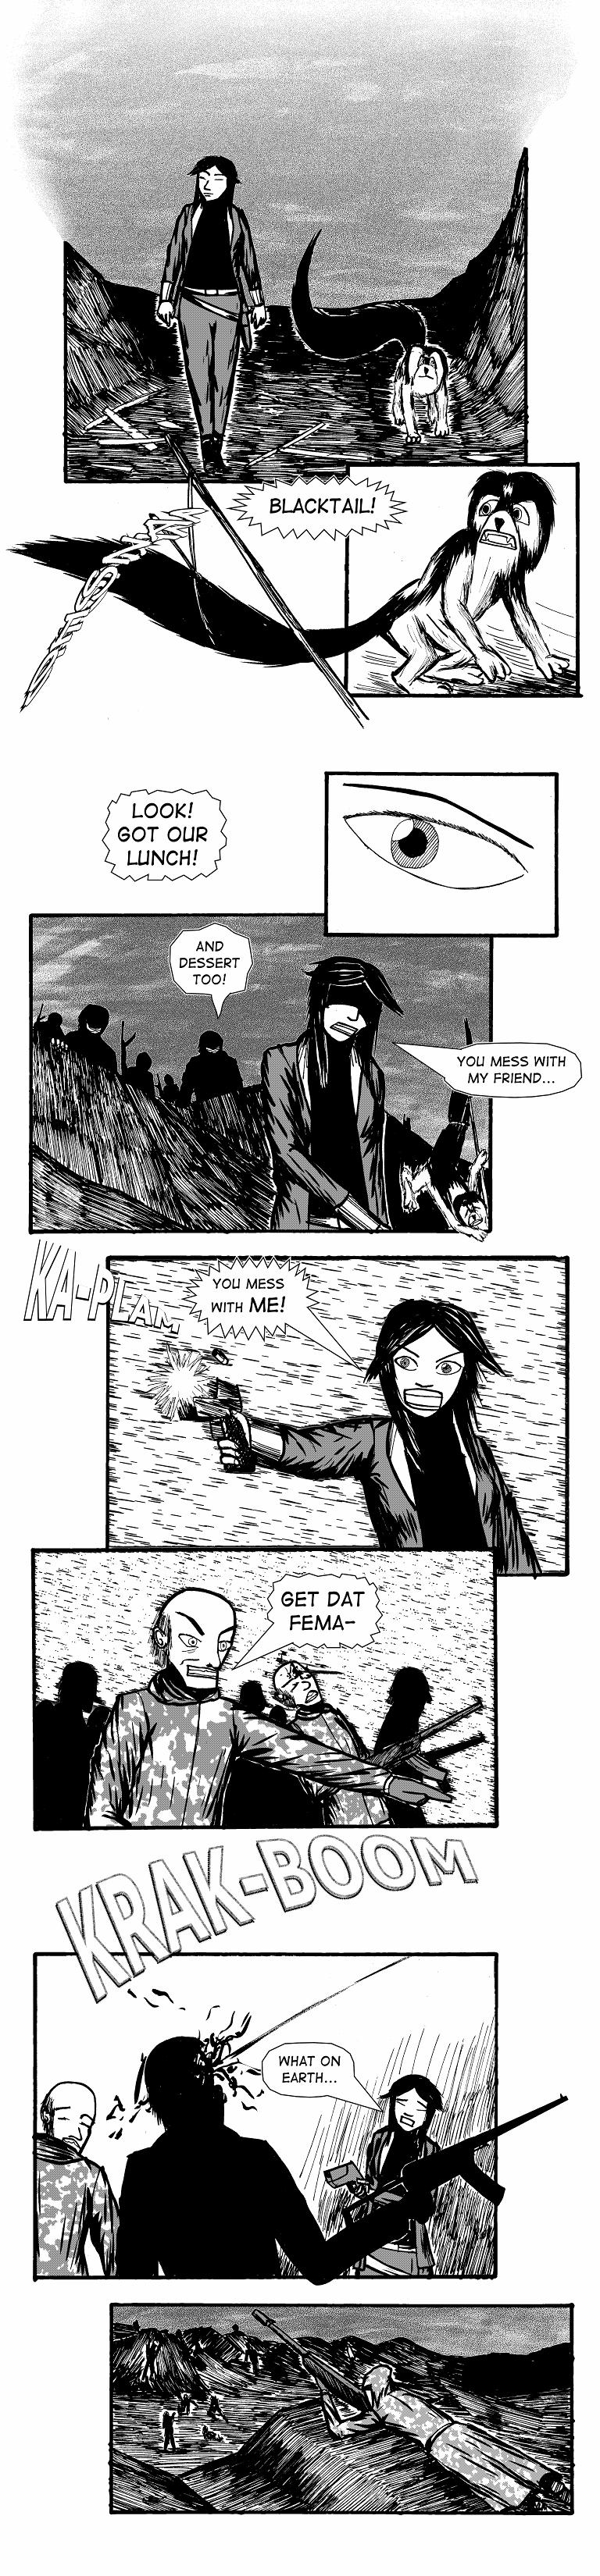 The Search for Murmilna (Crossover 16-1): The Metallic